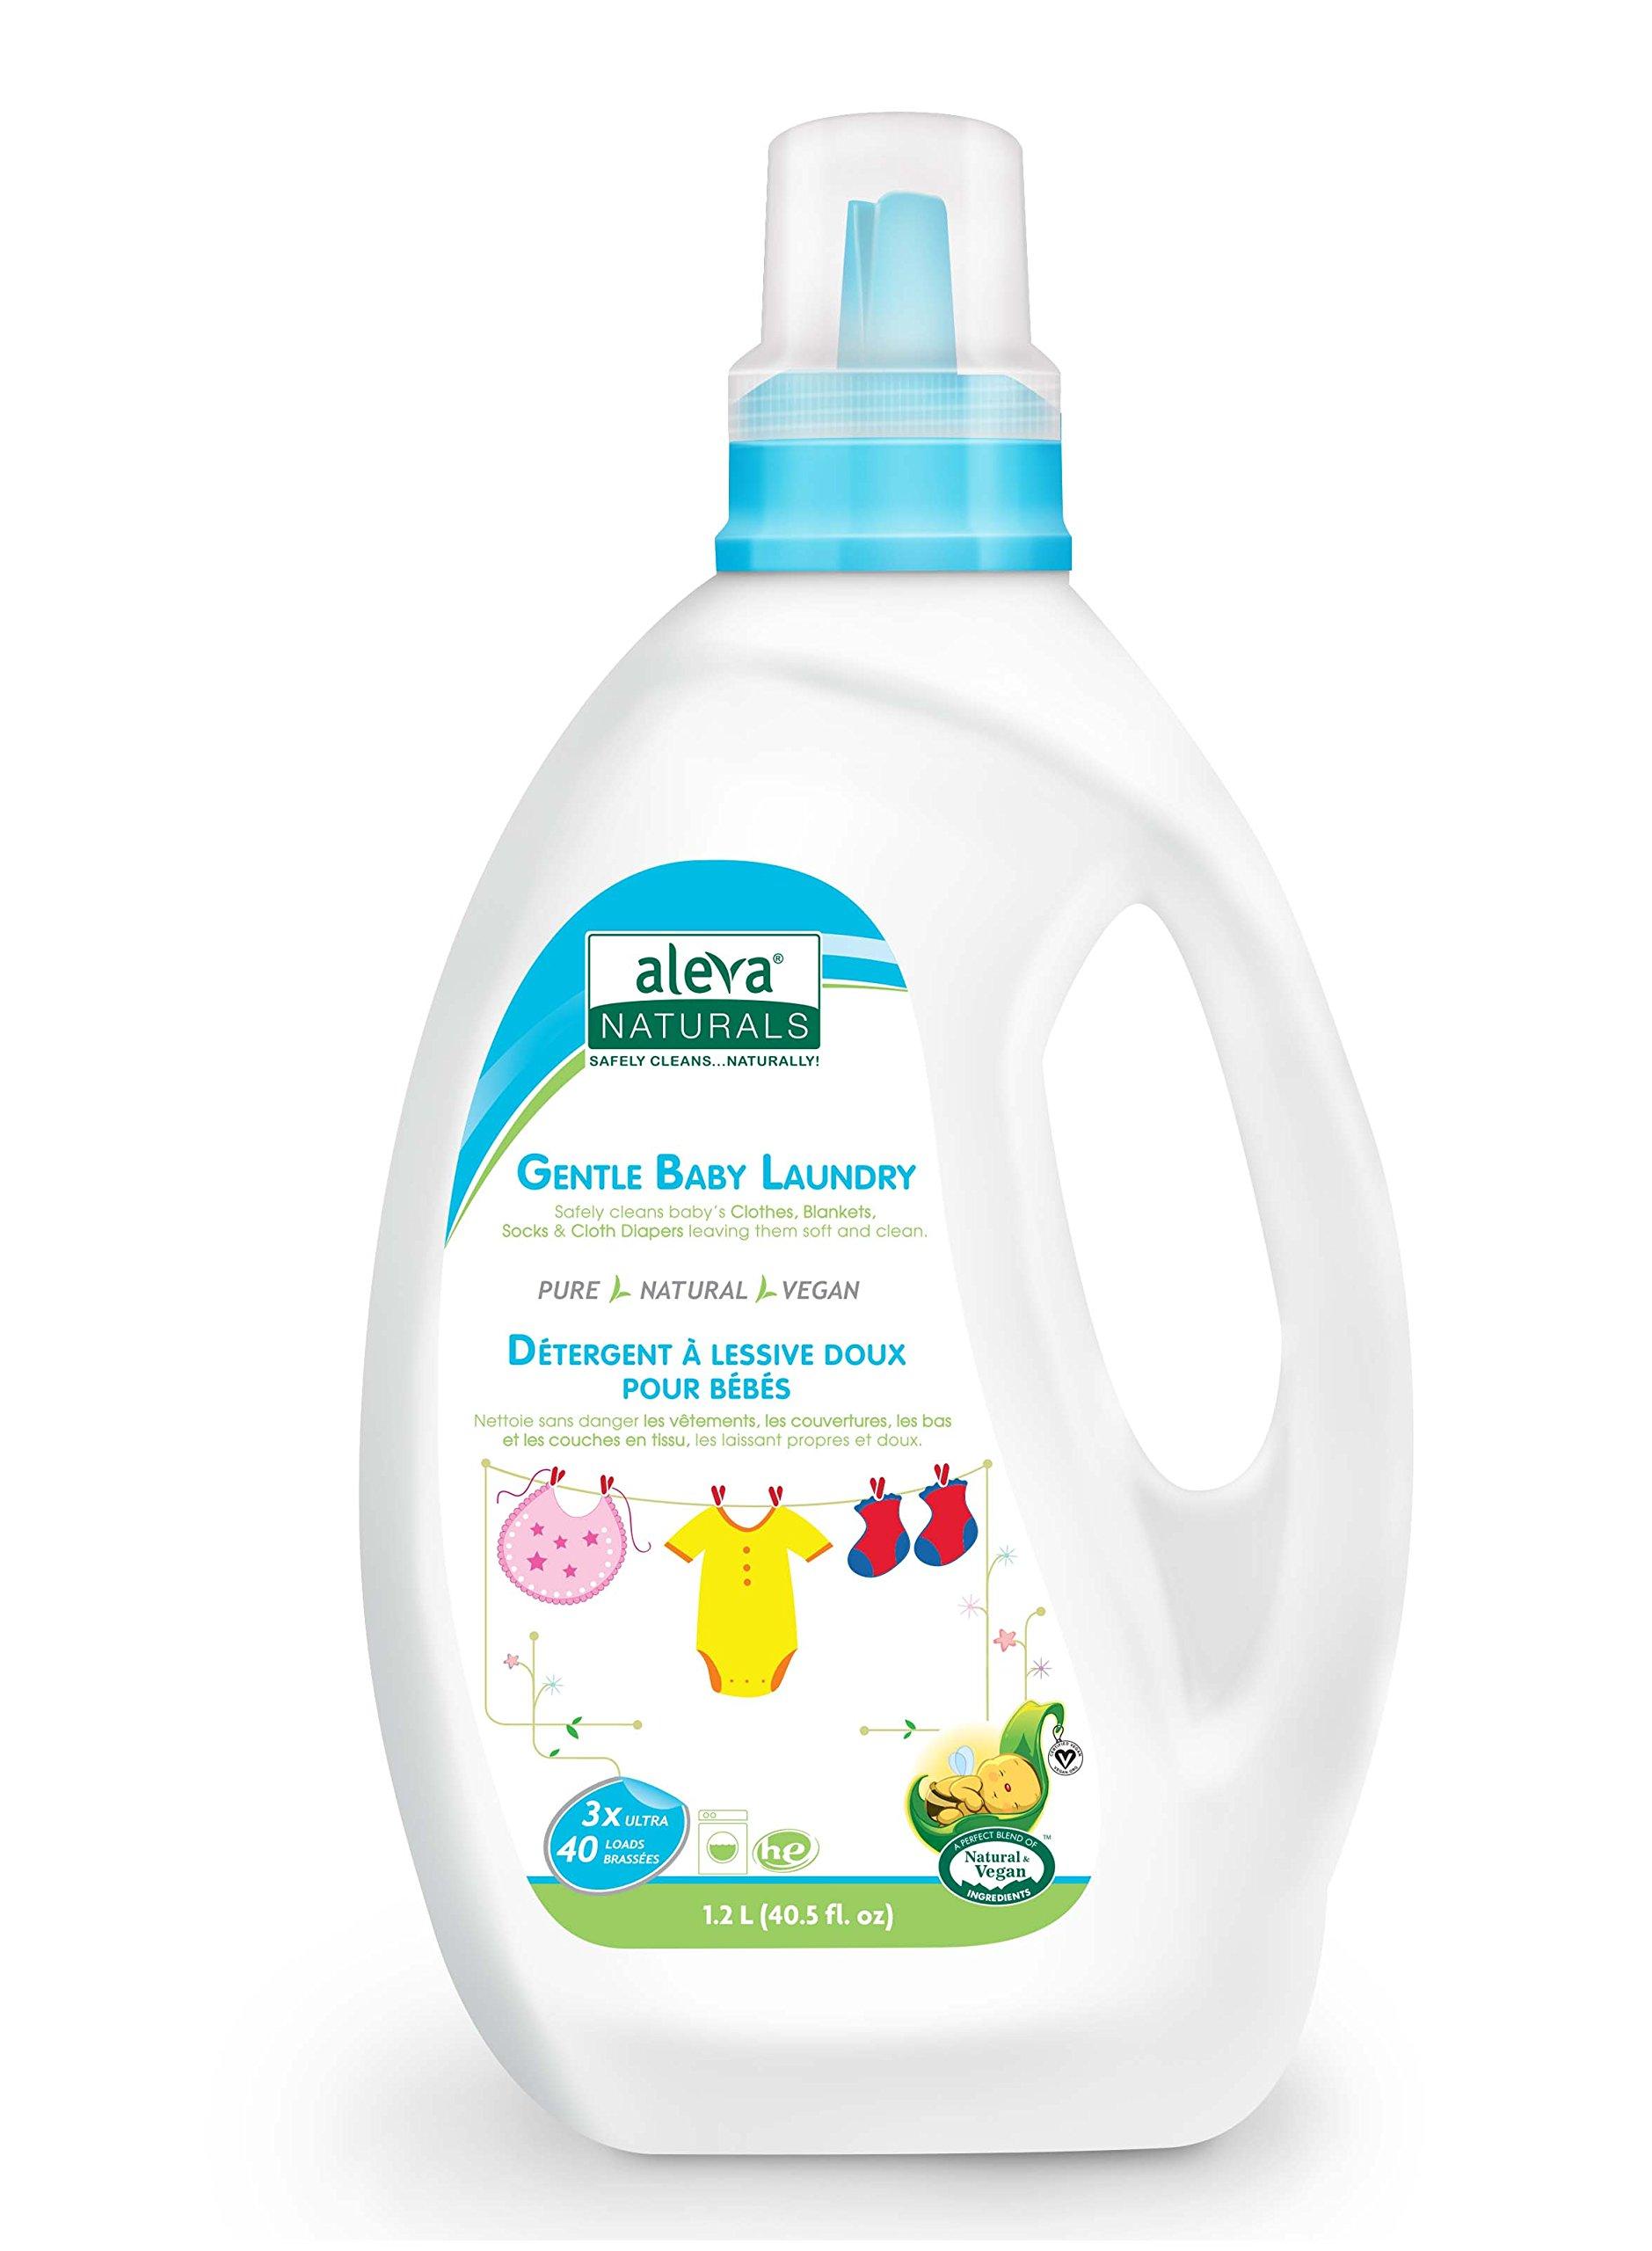 Aleva Naturals Gentle Baby Laundry, (40 Loads) 40 fl.oz / 1.02L by Aleva Naturals